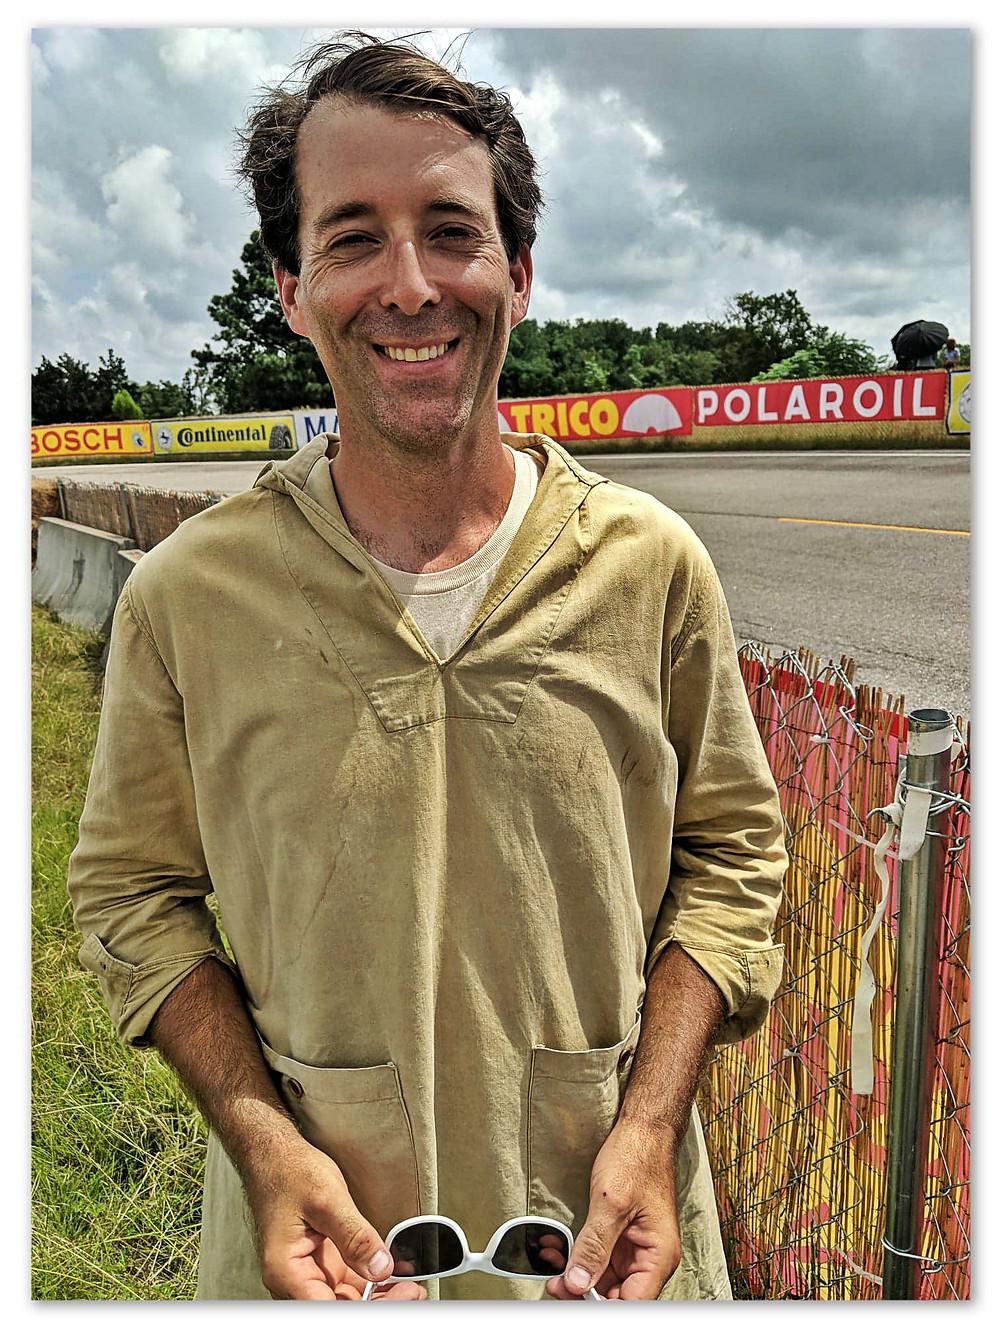 Fellow extra Dan Shindelbower, Jr. of Jacksonville, Florida.